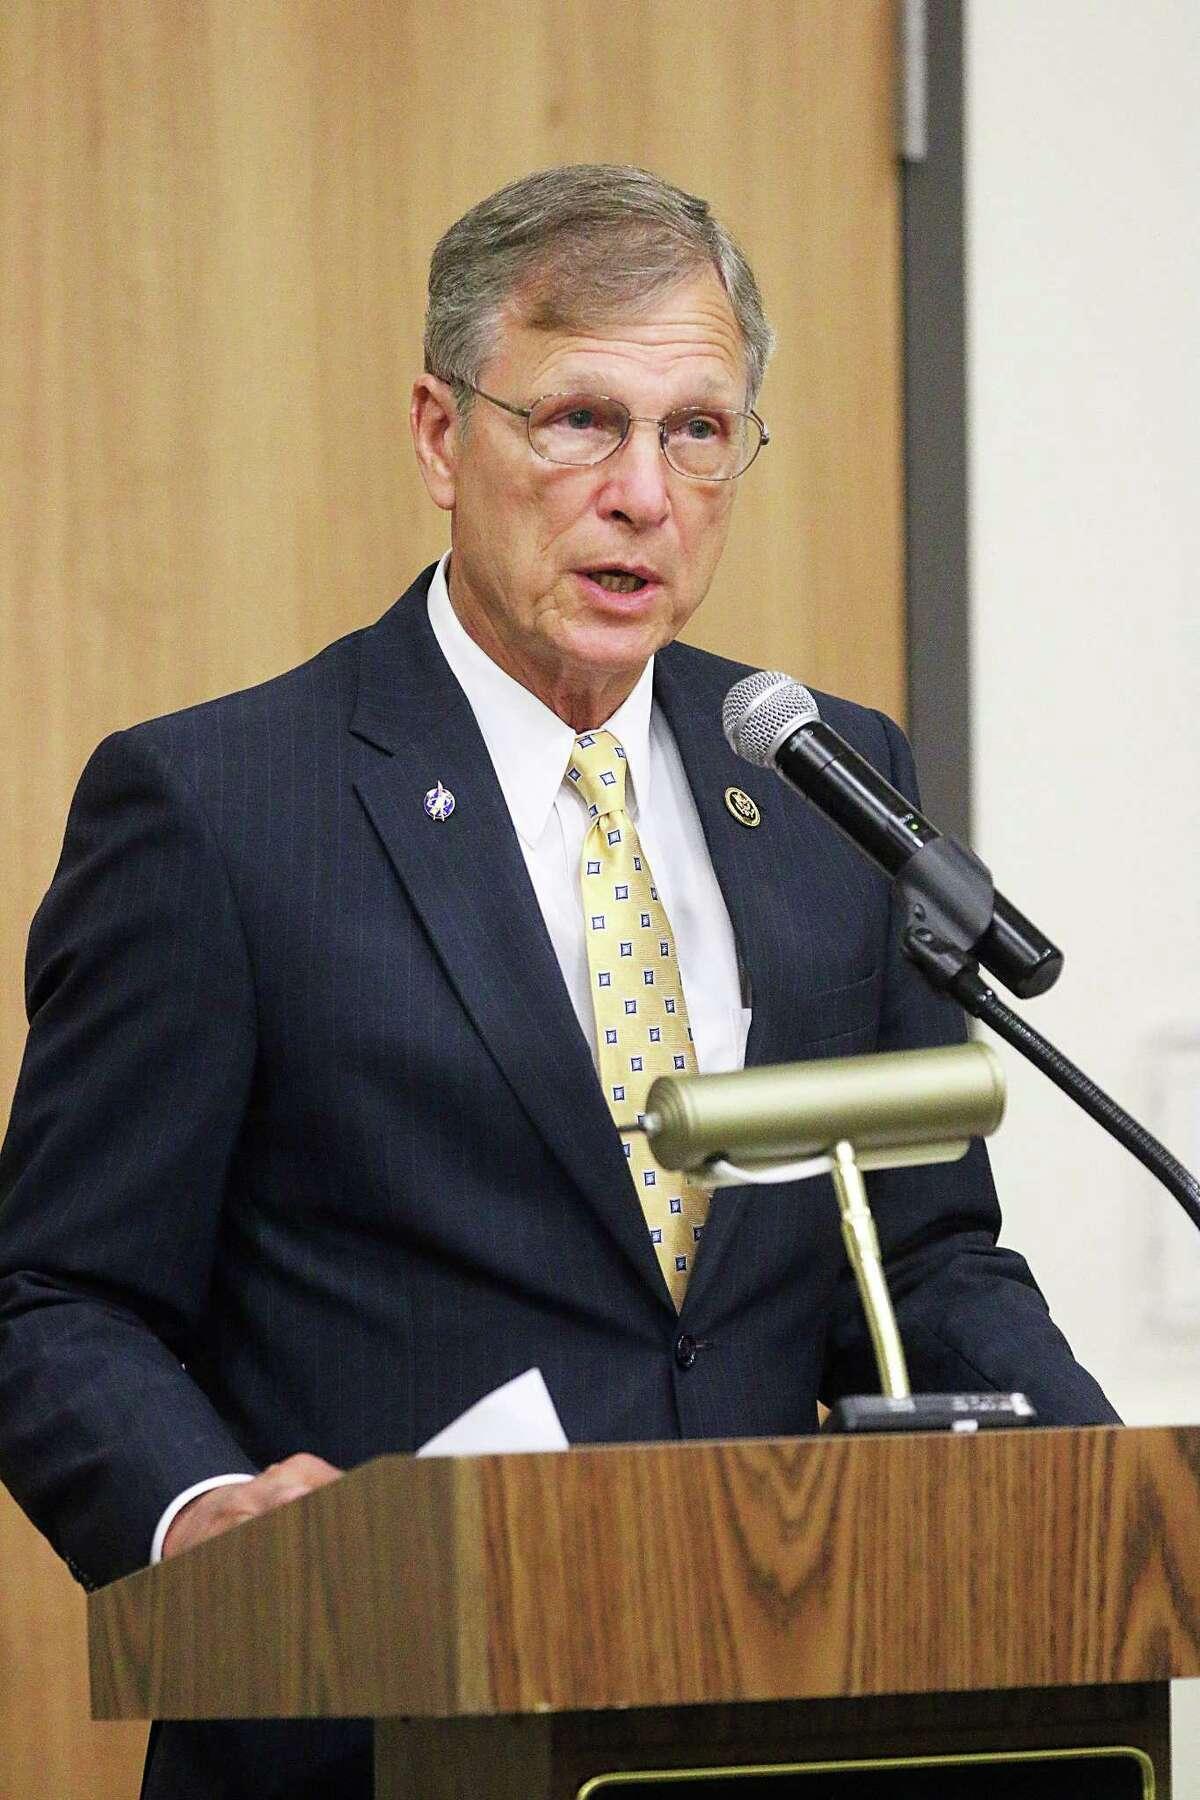 Congressman Dr. Brian Babin, R-Woodville, received $81 in farm subsidies.